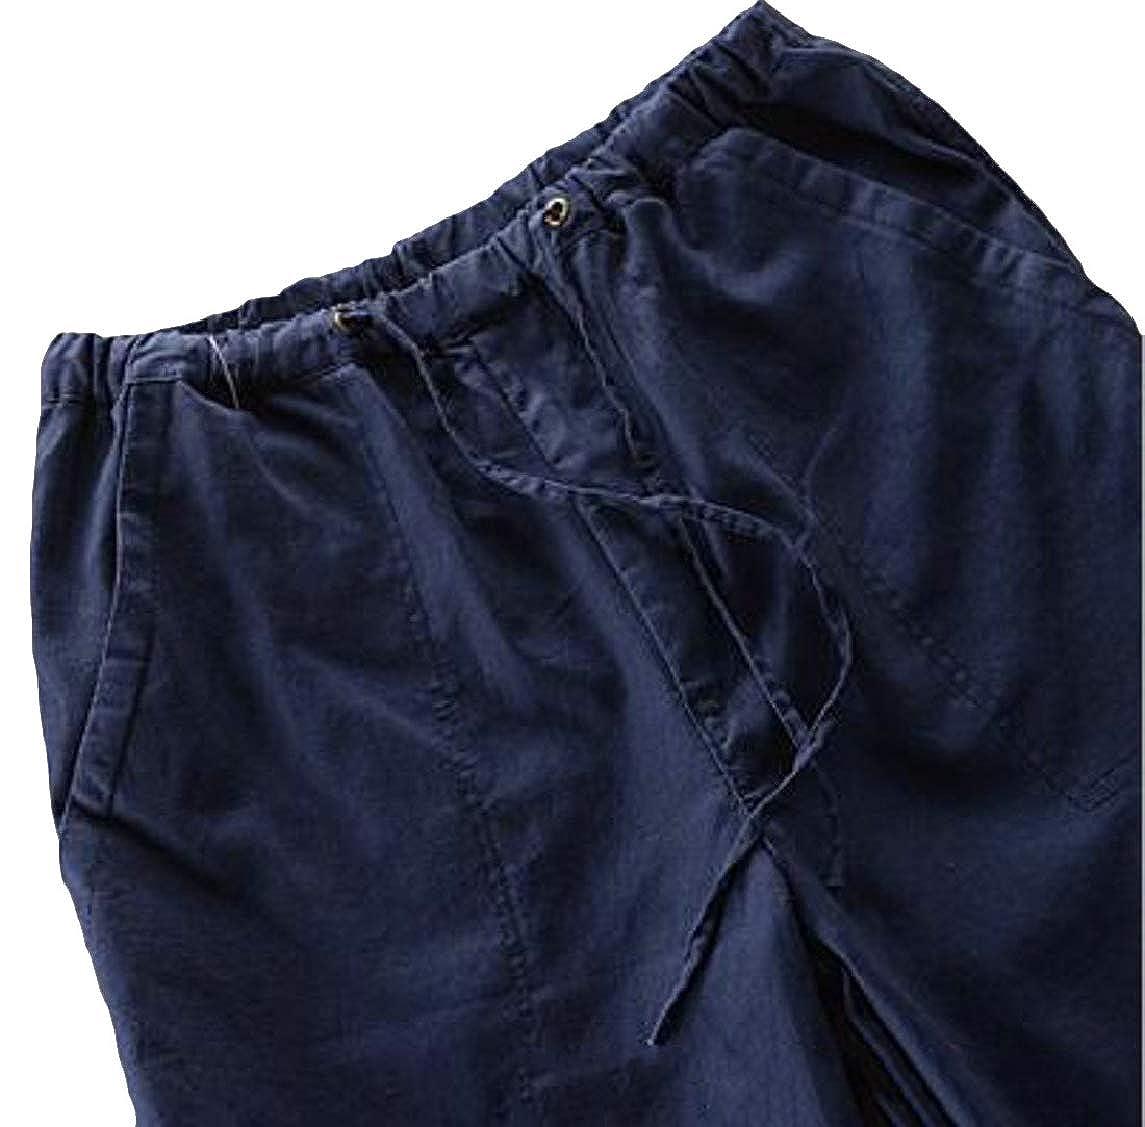 Jmwss QD Mens Linen Casual Pants Elastic Waist Loose Fit Trousers Beach Pant